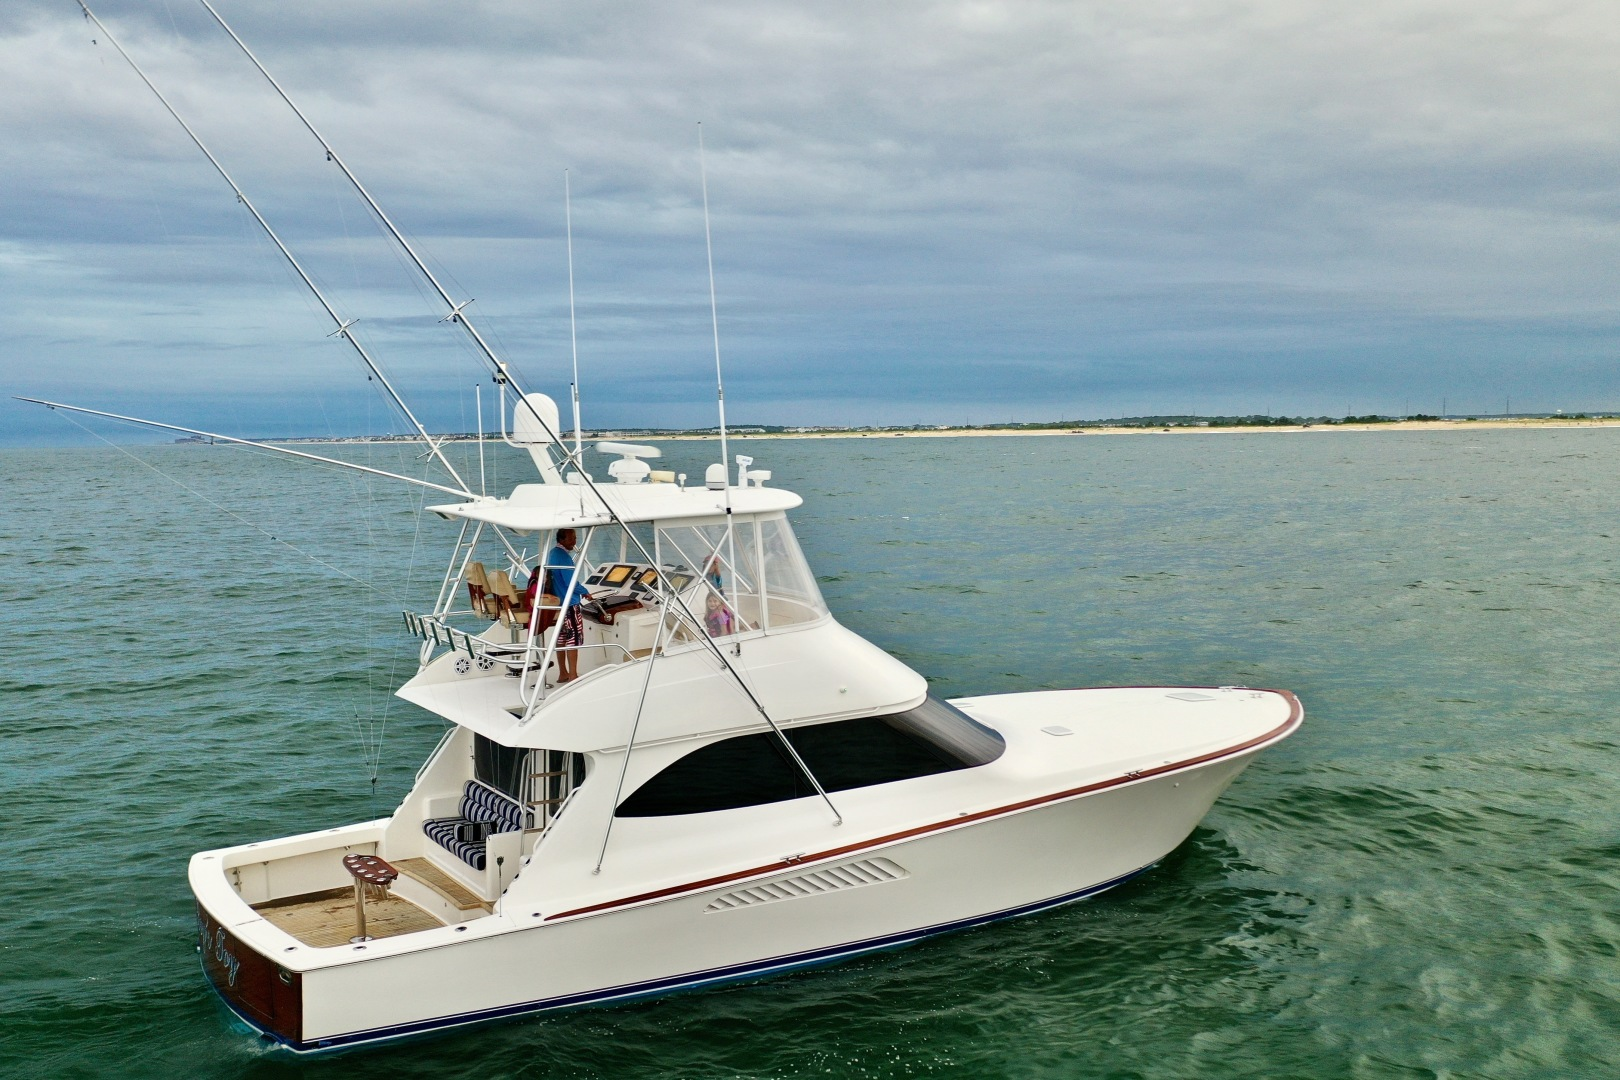 Viking-50 Convertible 2009-Boys Toy Bethany Beach-Delaware-United States-2009 Viking 50 Convertible Stbd Profile-1453621 | Thumbnail